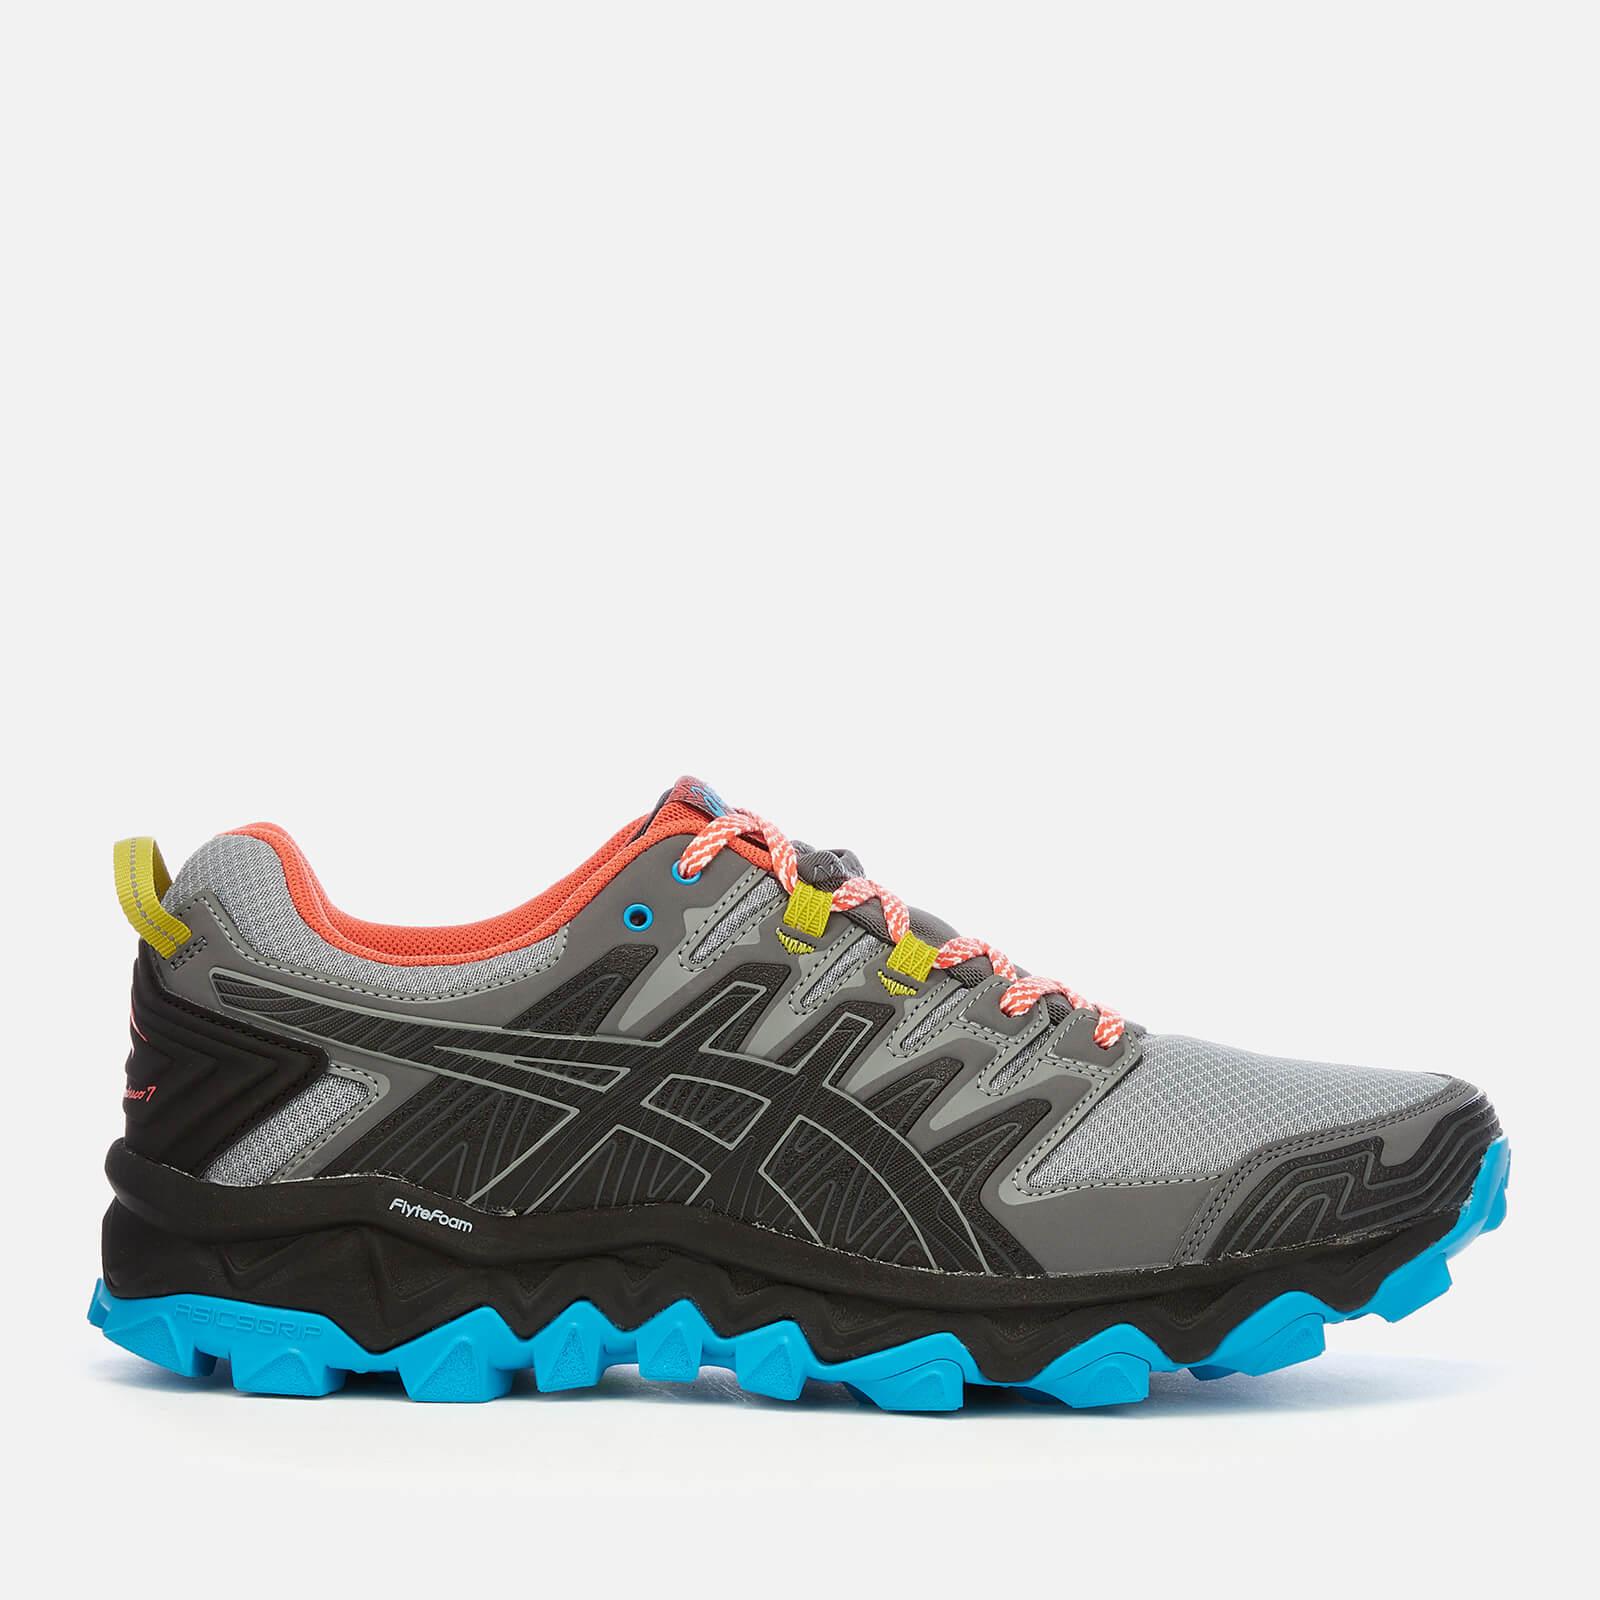 Asics Men's Running Trail Gel-Fujitrabuco 7 Trainers - Stone Grey/Black - UK 7 - Grey